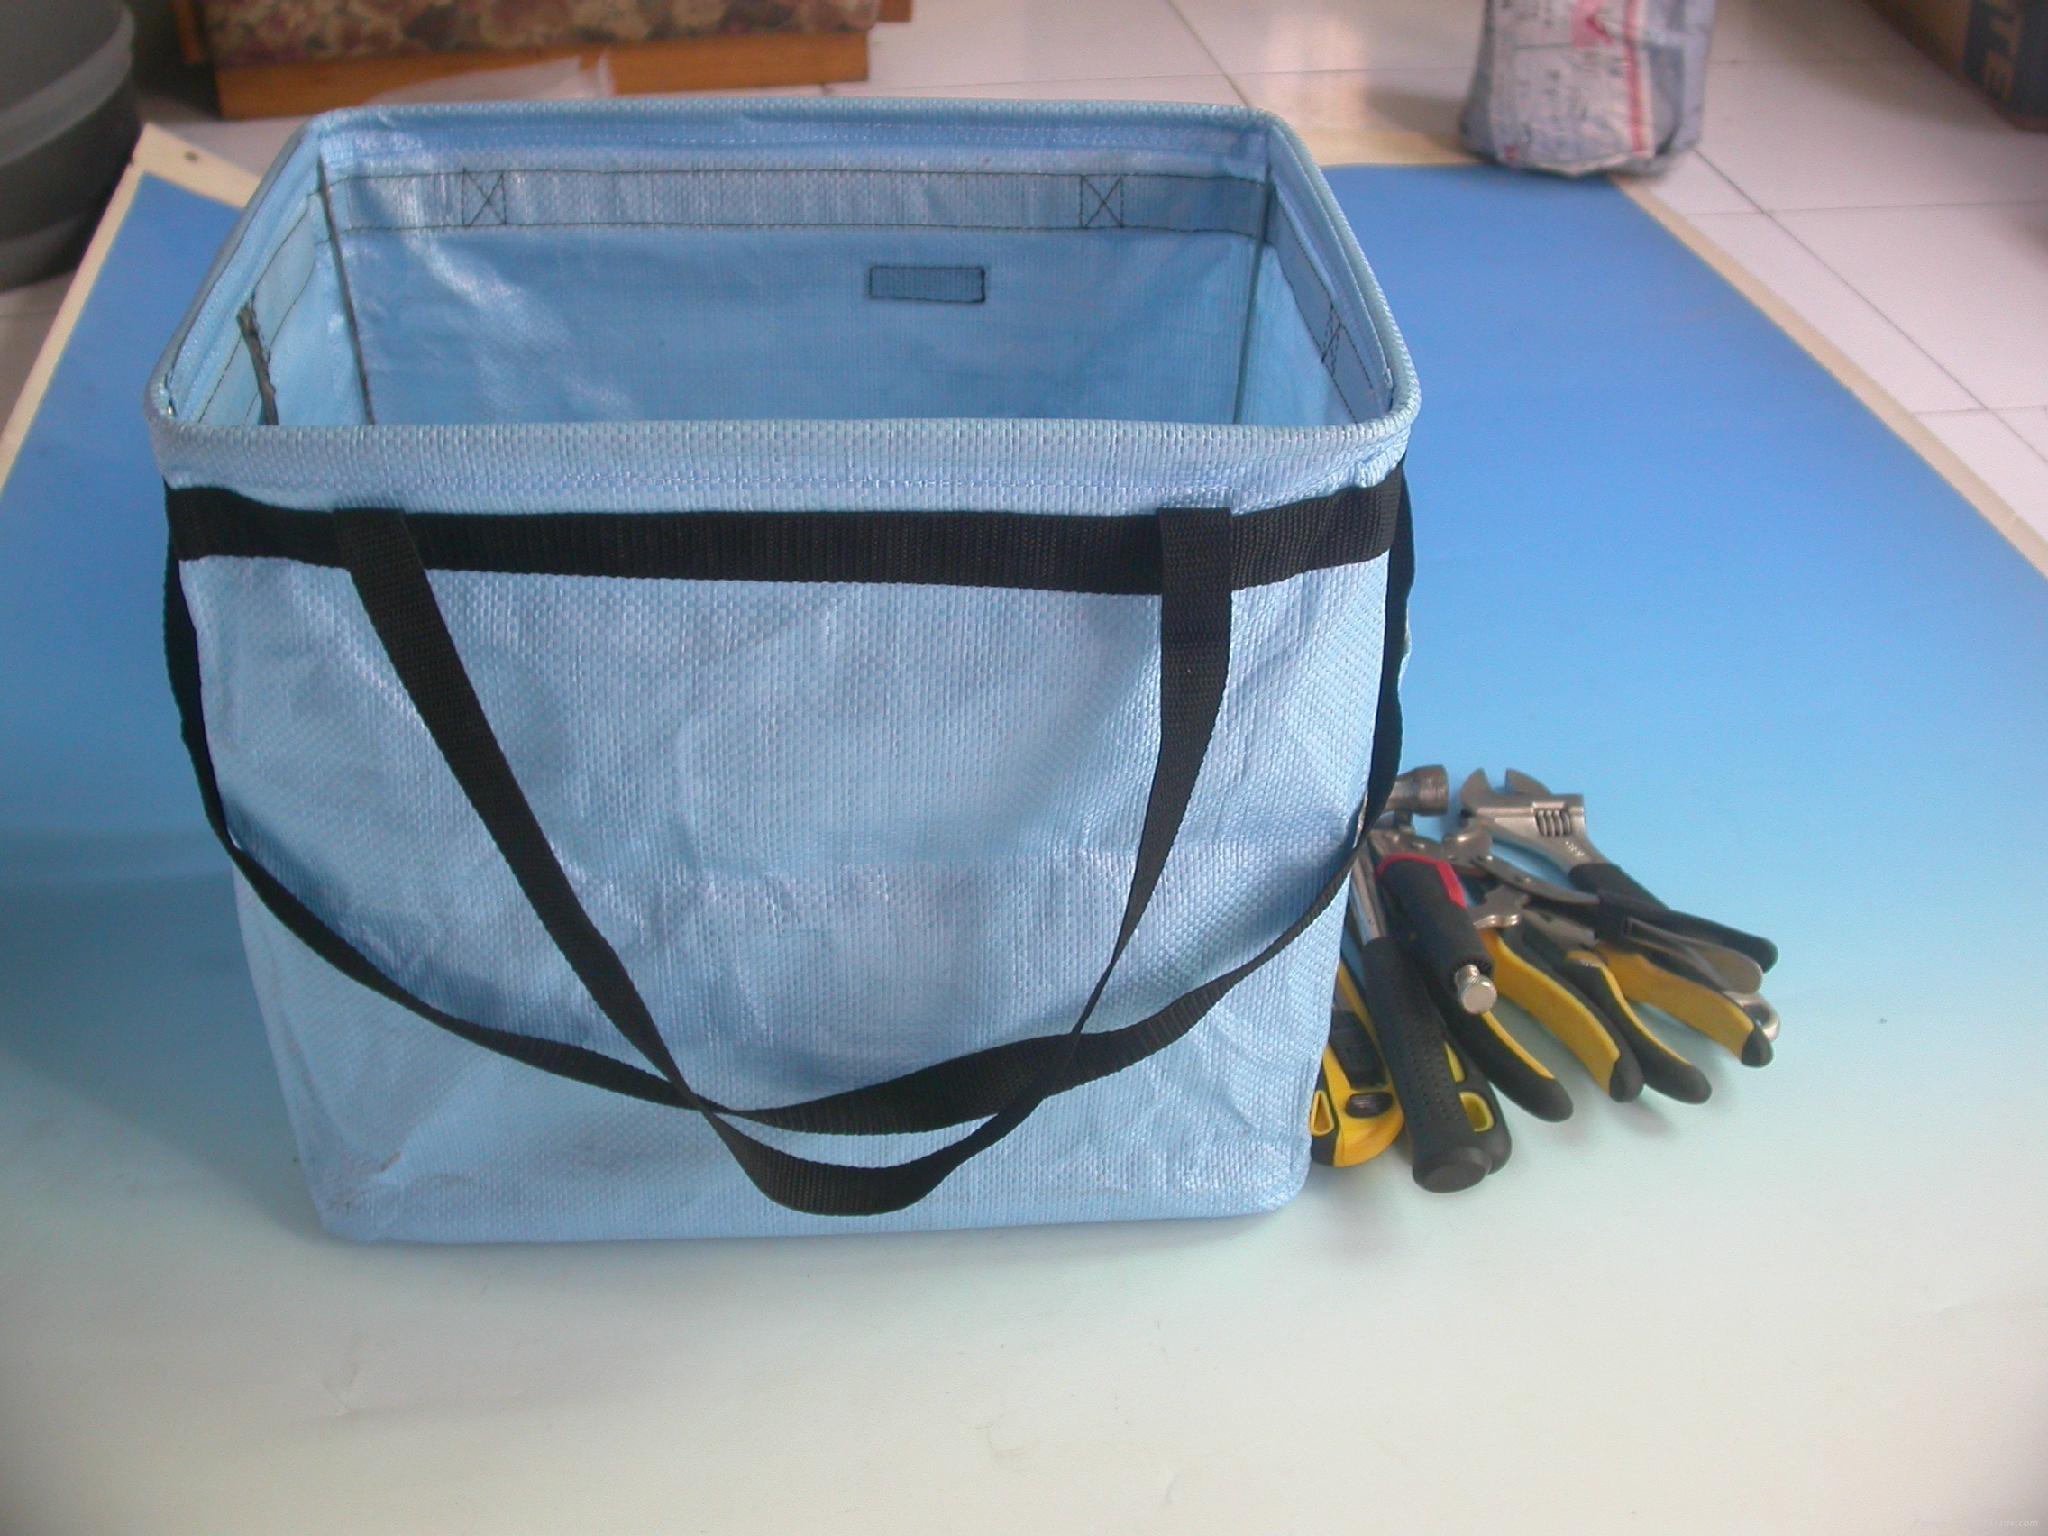 Utility Pocket Pouch garden tool bag 1